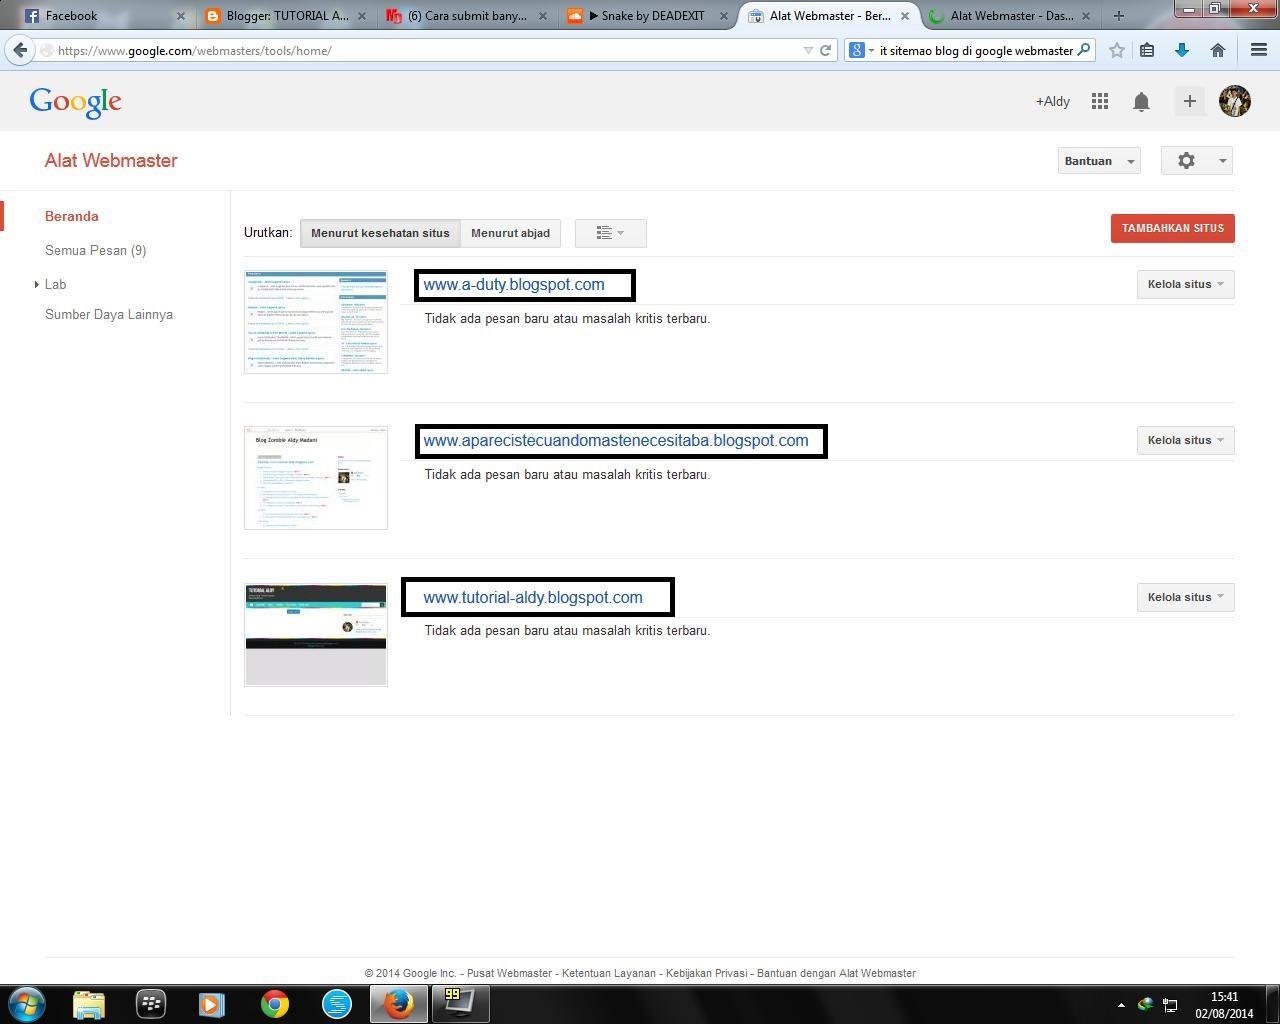 Cara Mensubmit Banyak Sitemap Blog Ke Google Webmaster